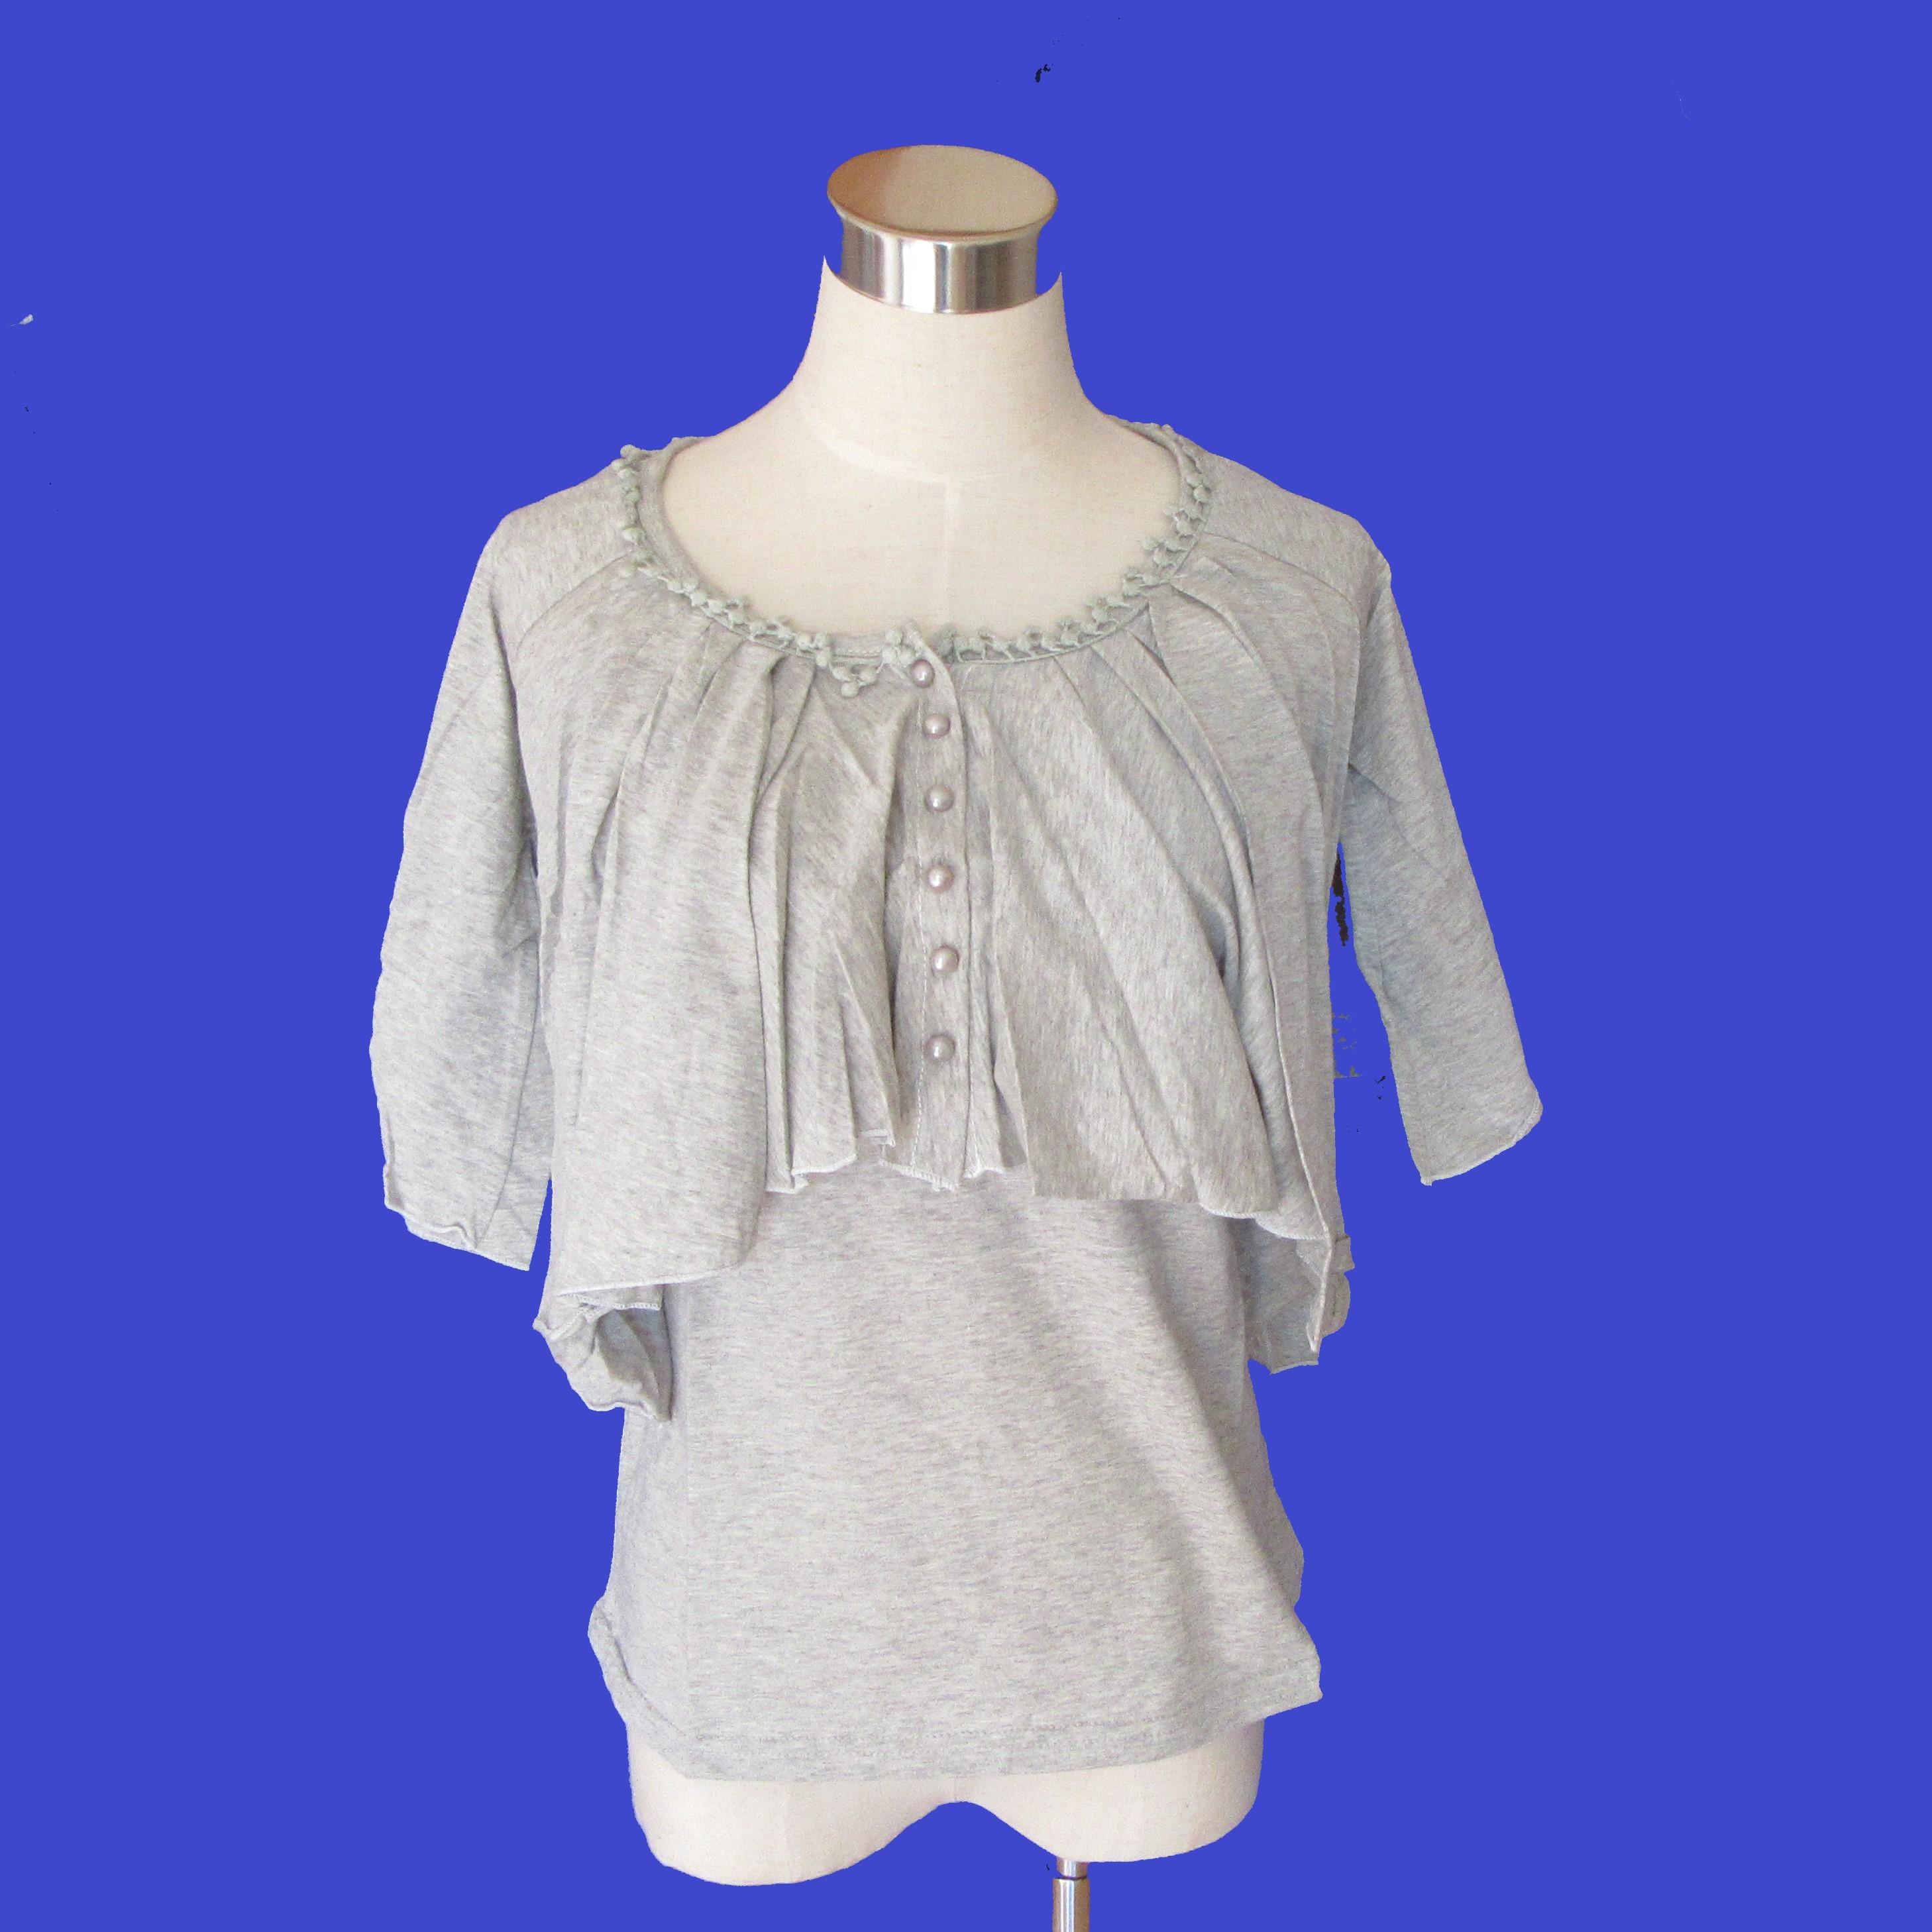 q.b.c Tシャツ キャミソール セット Mサイズ 新品